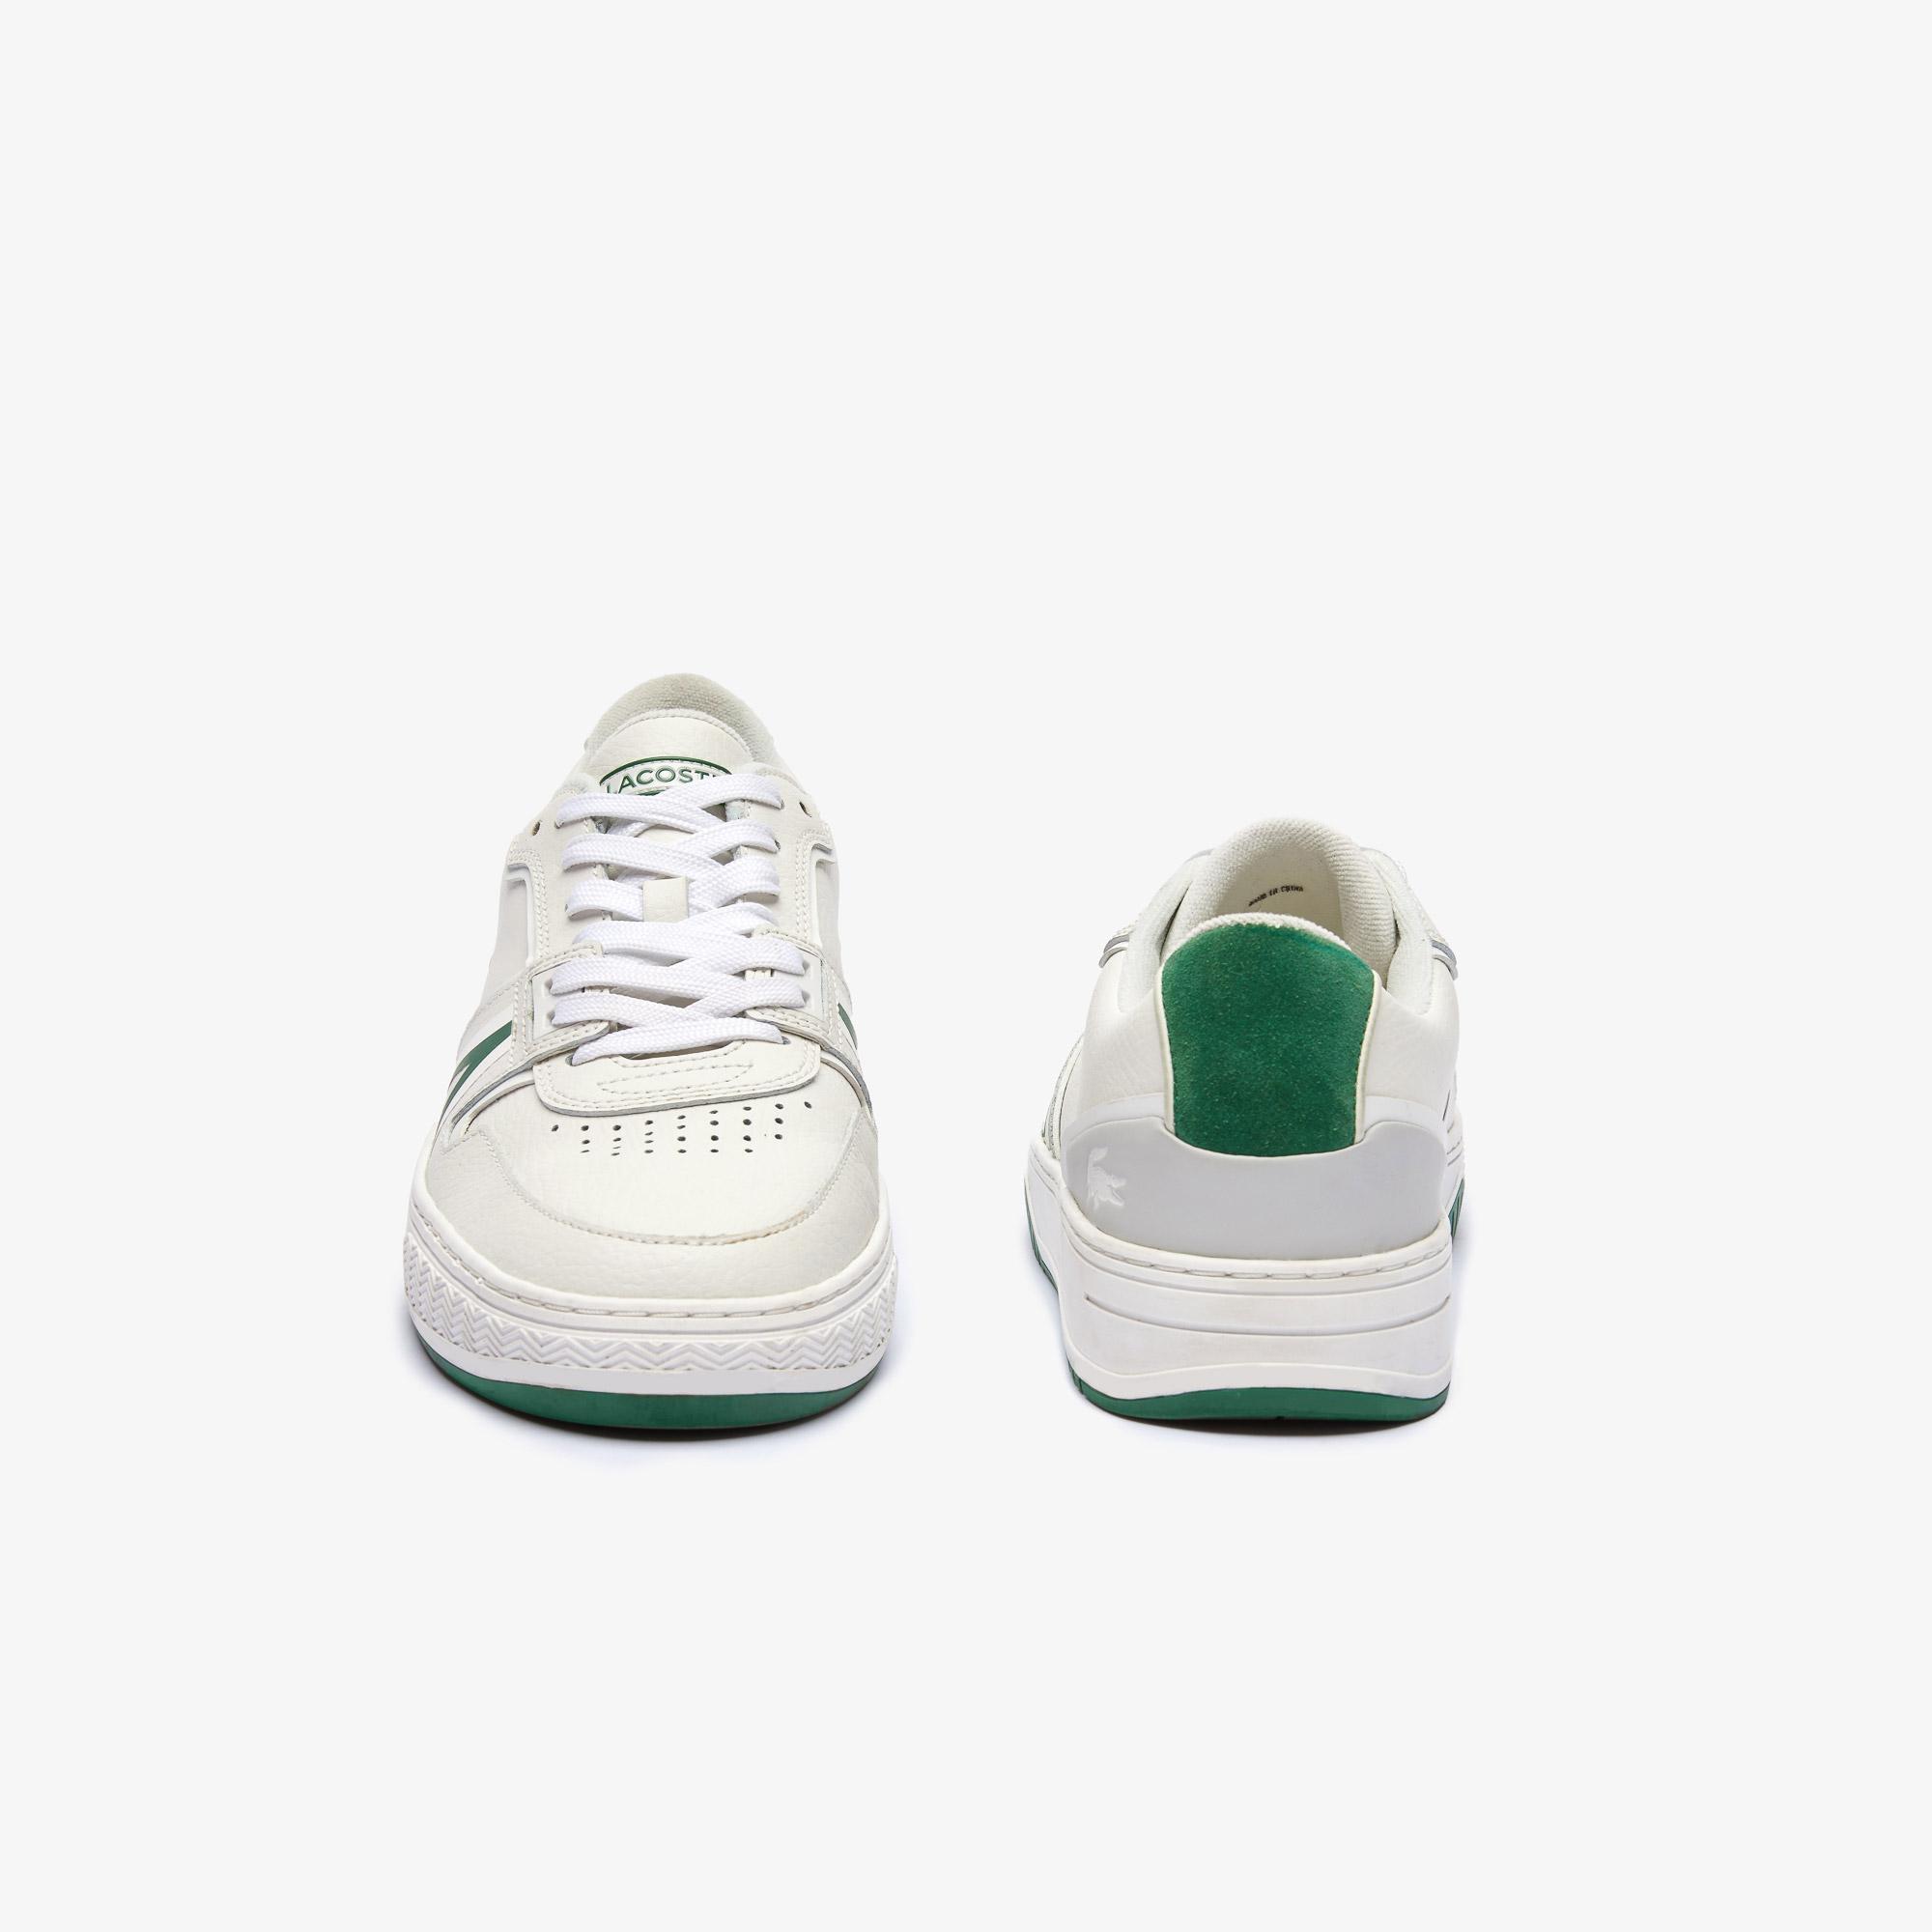 Lacoste L001 0321 1 Sma Erkek Deri Beyaz - Yeşil Sneaker